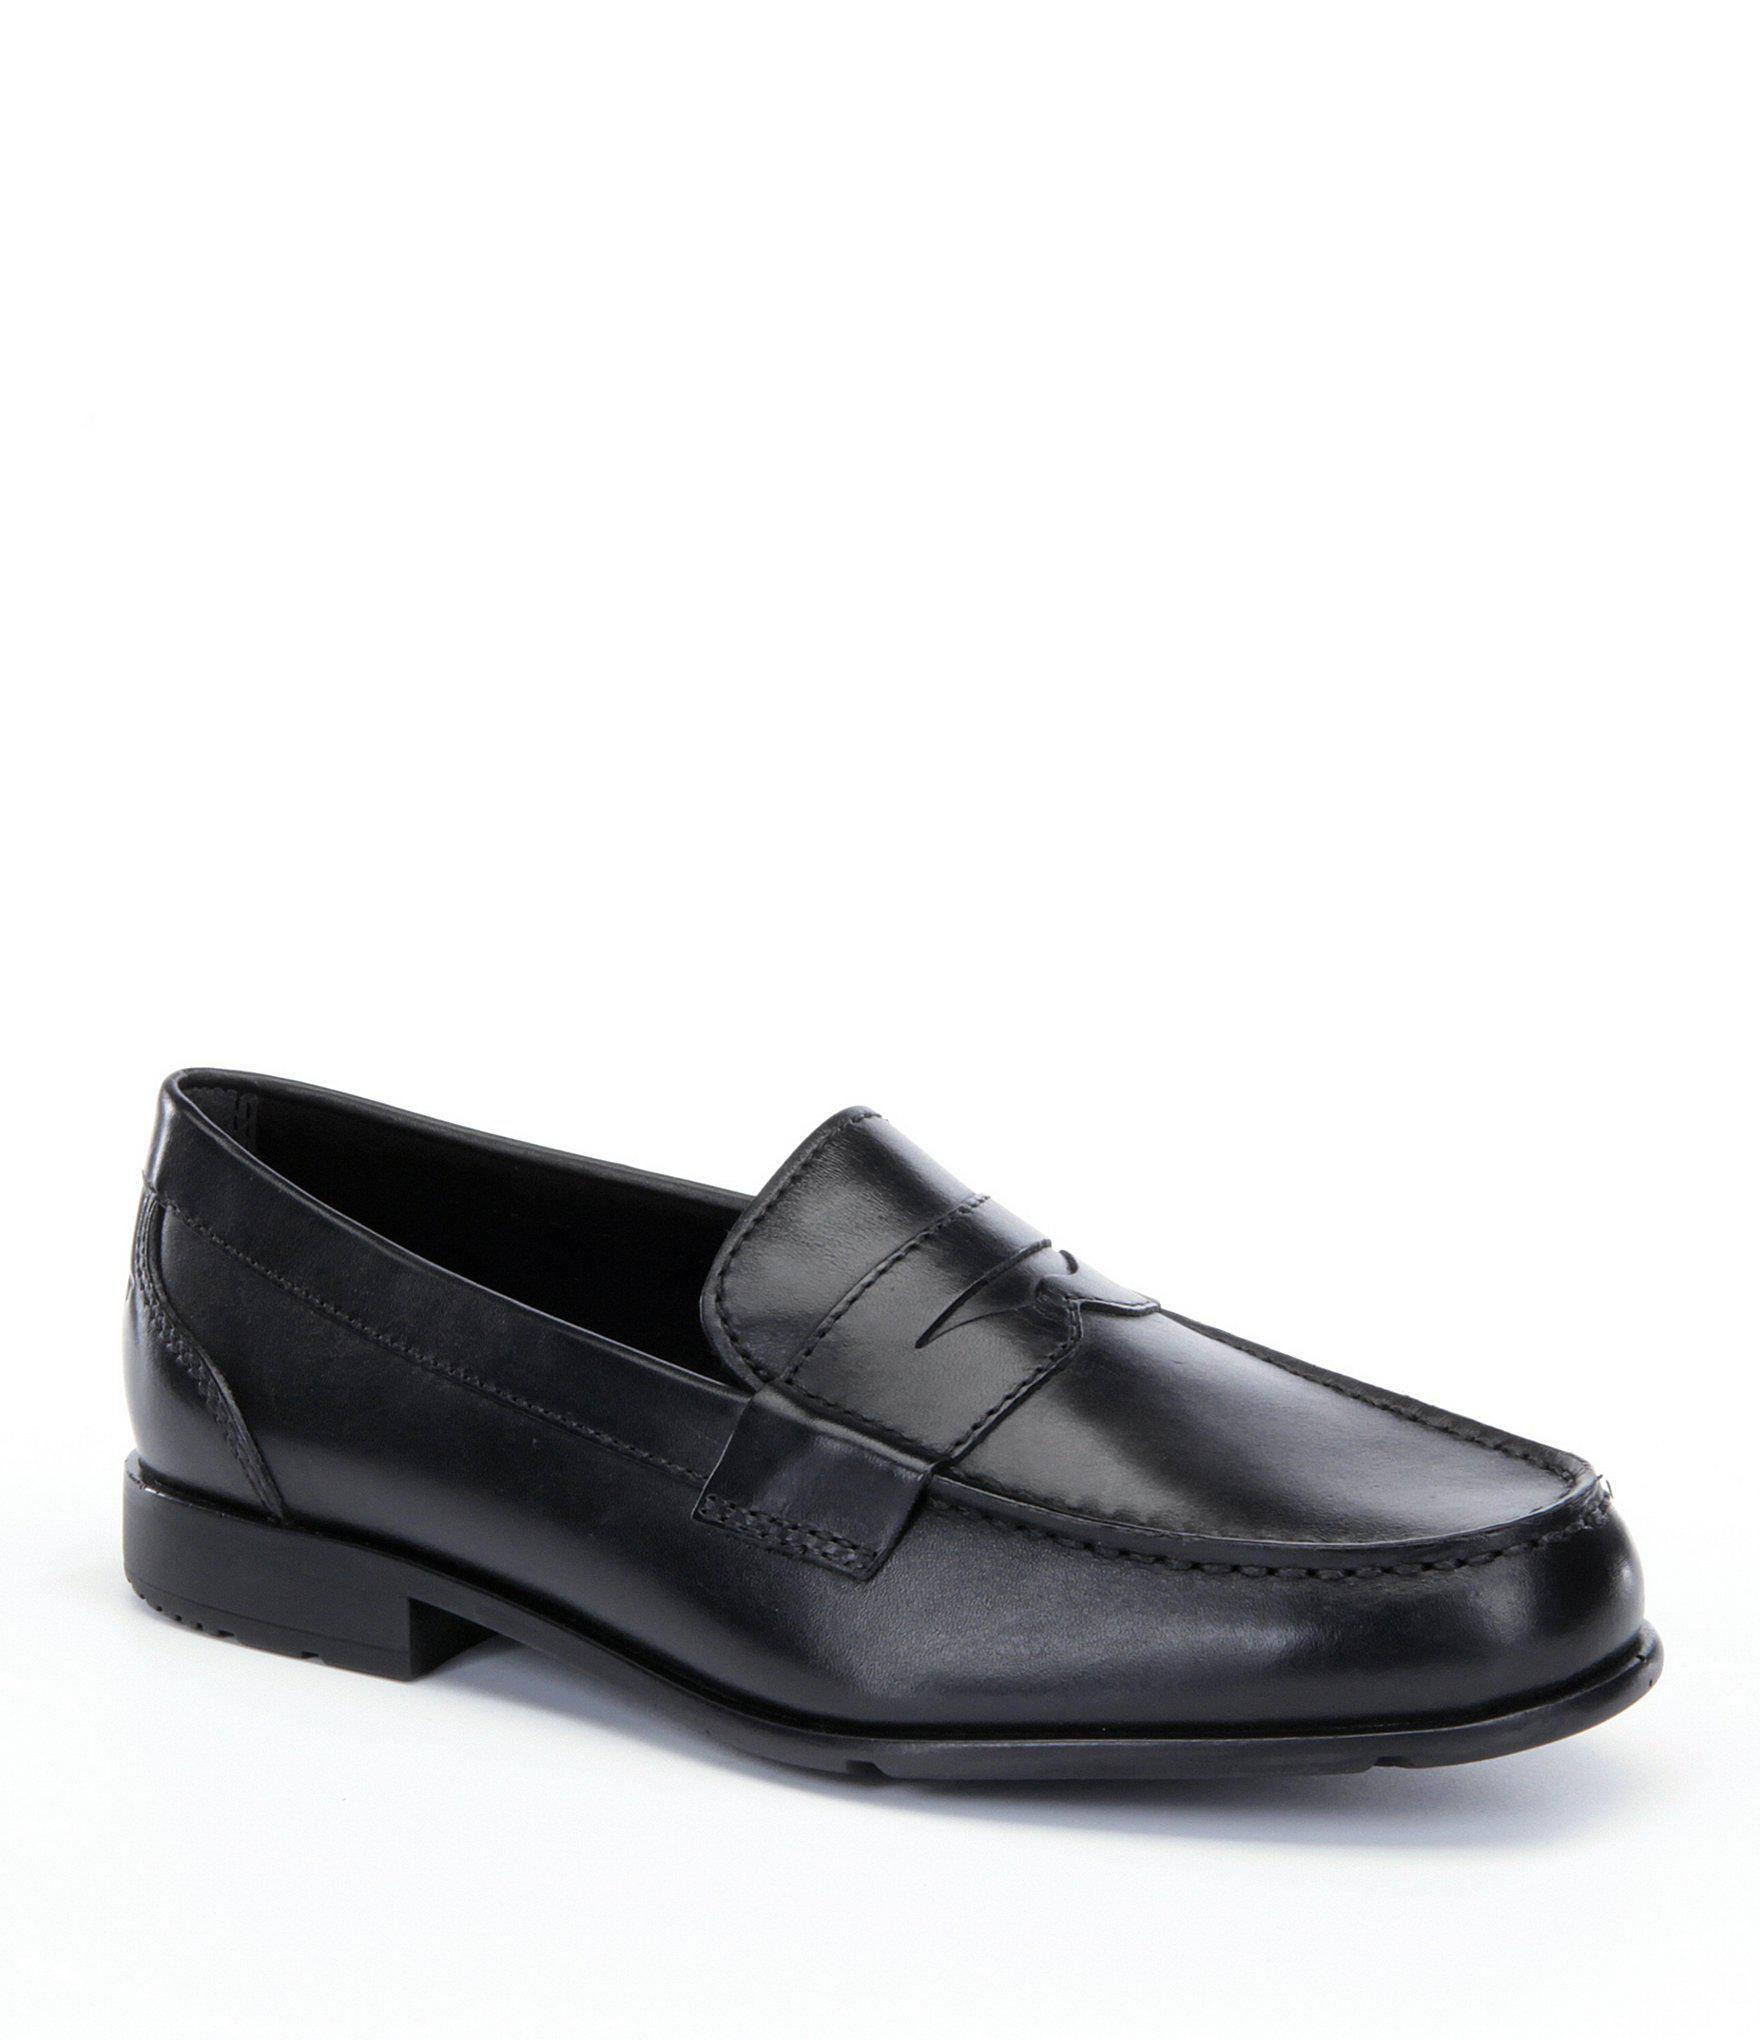 c565b5c089e Rockport - Black Men s Lite Classic Penny Loafers for Men - Lyst. View  fullscreen